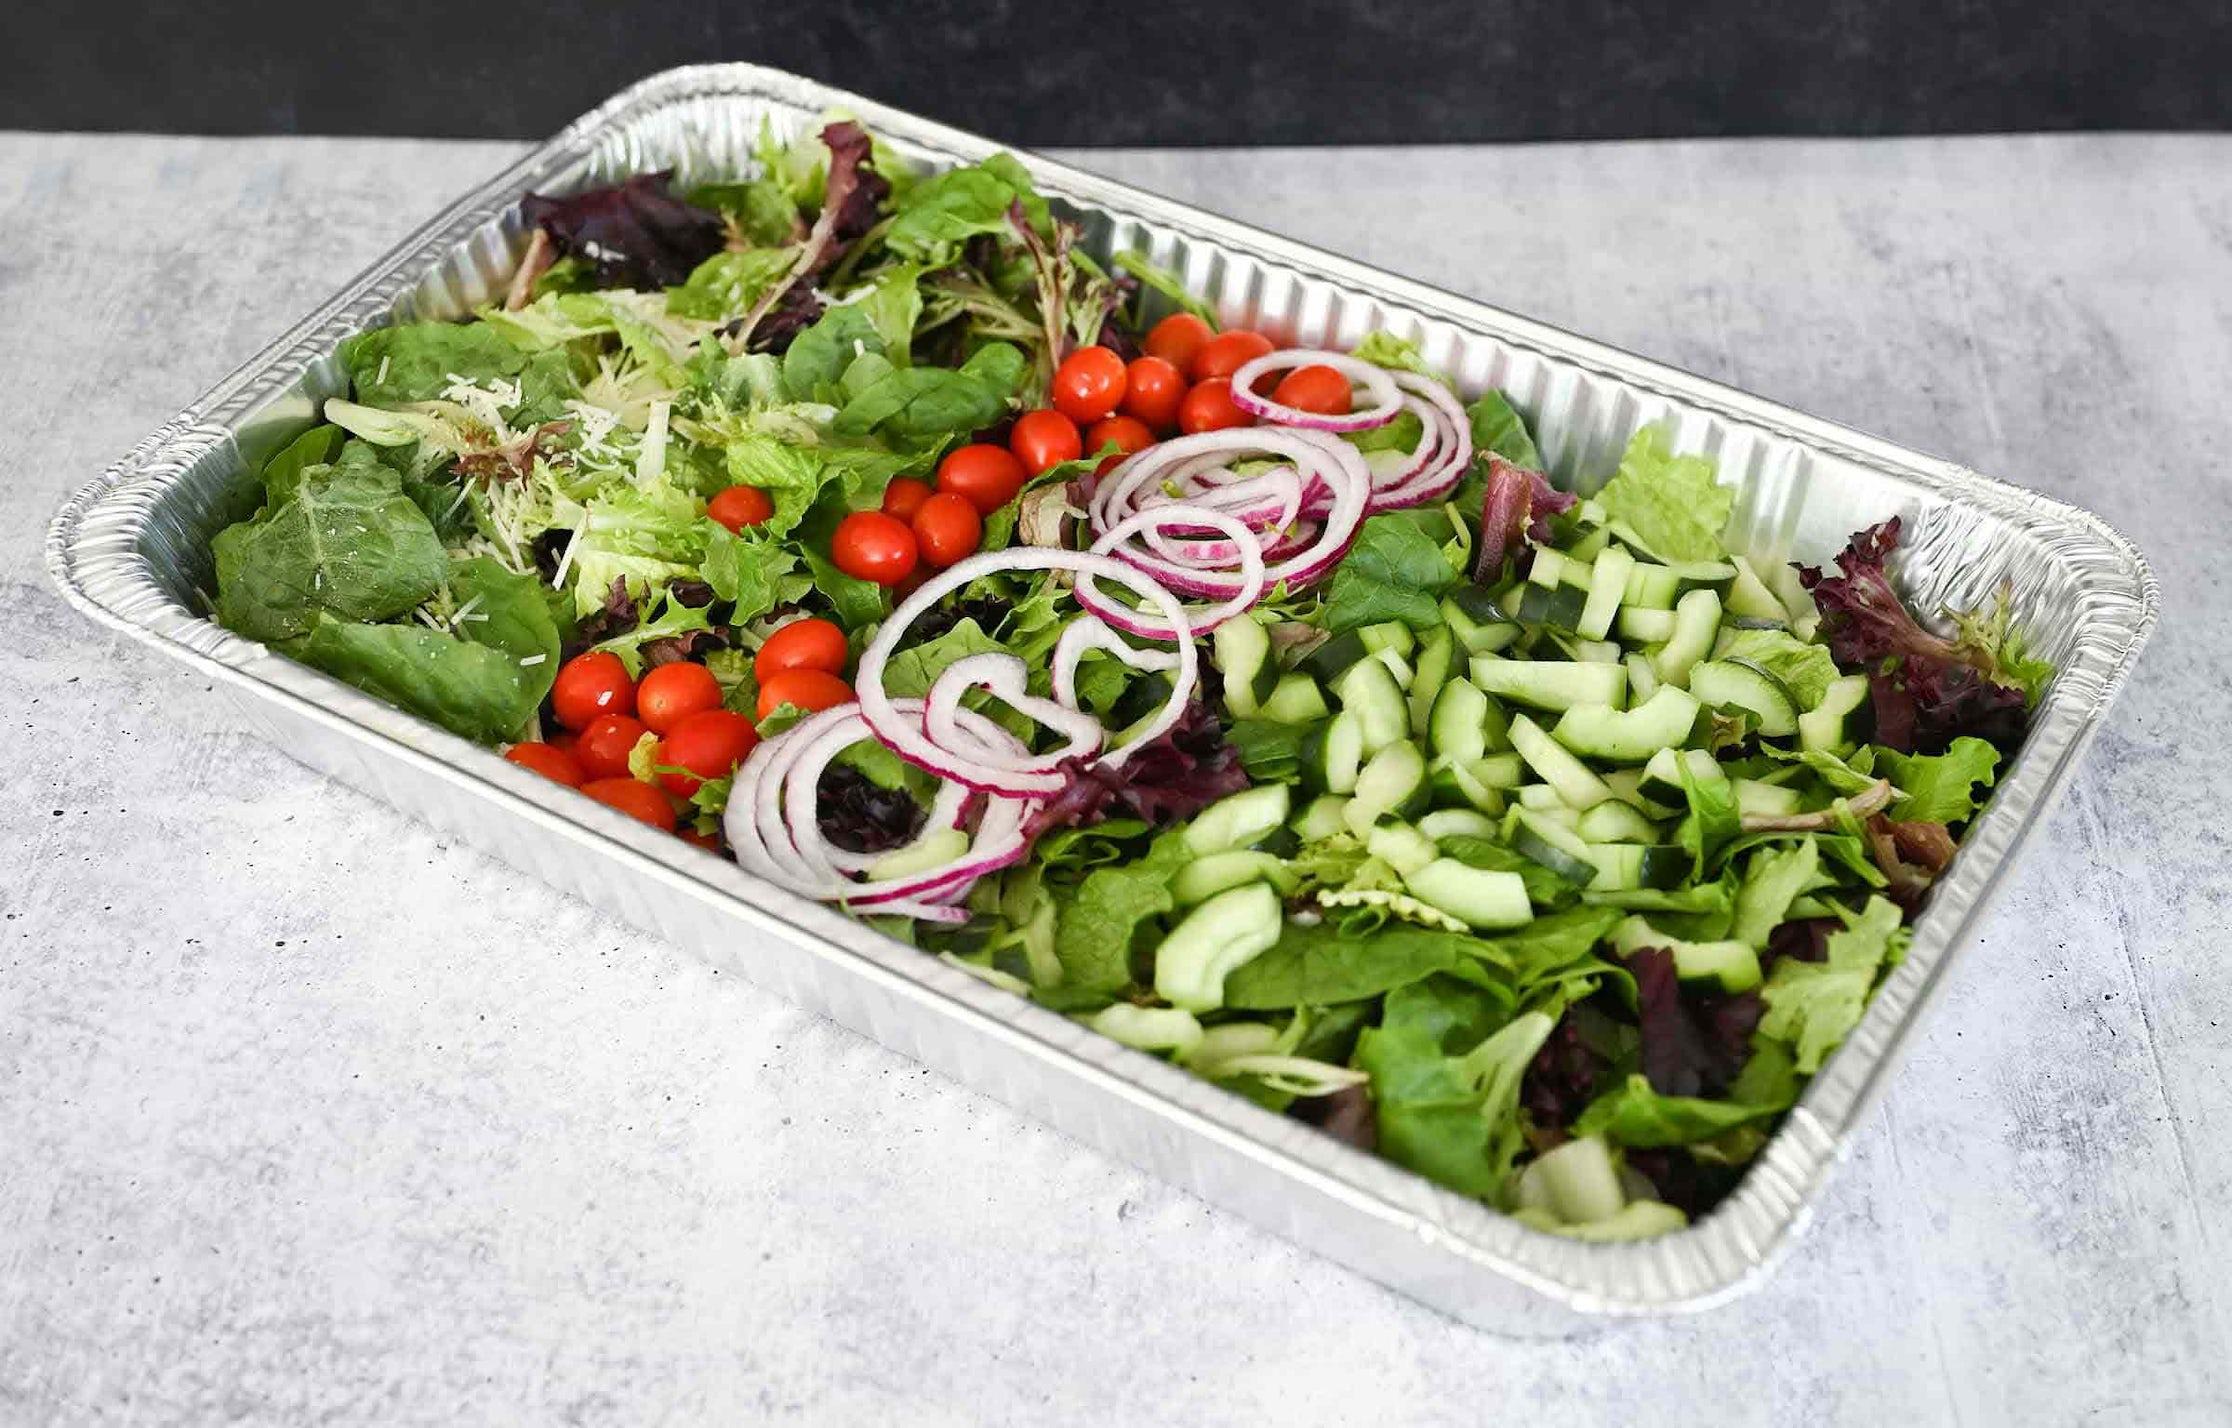 Jumbo Party Salad